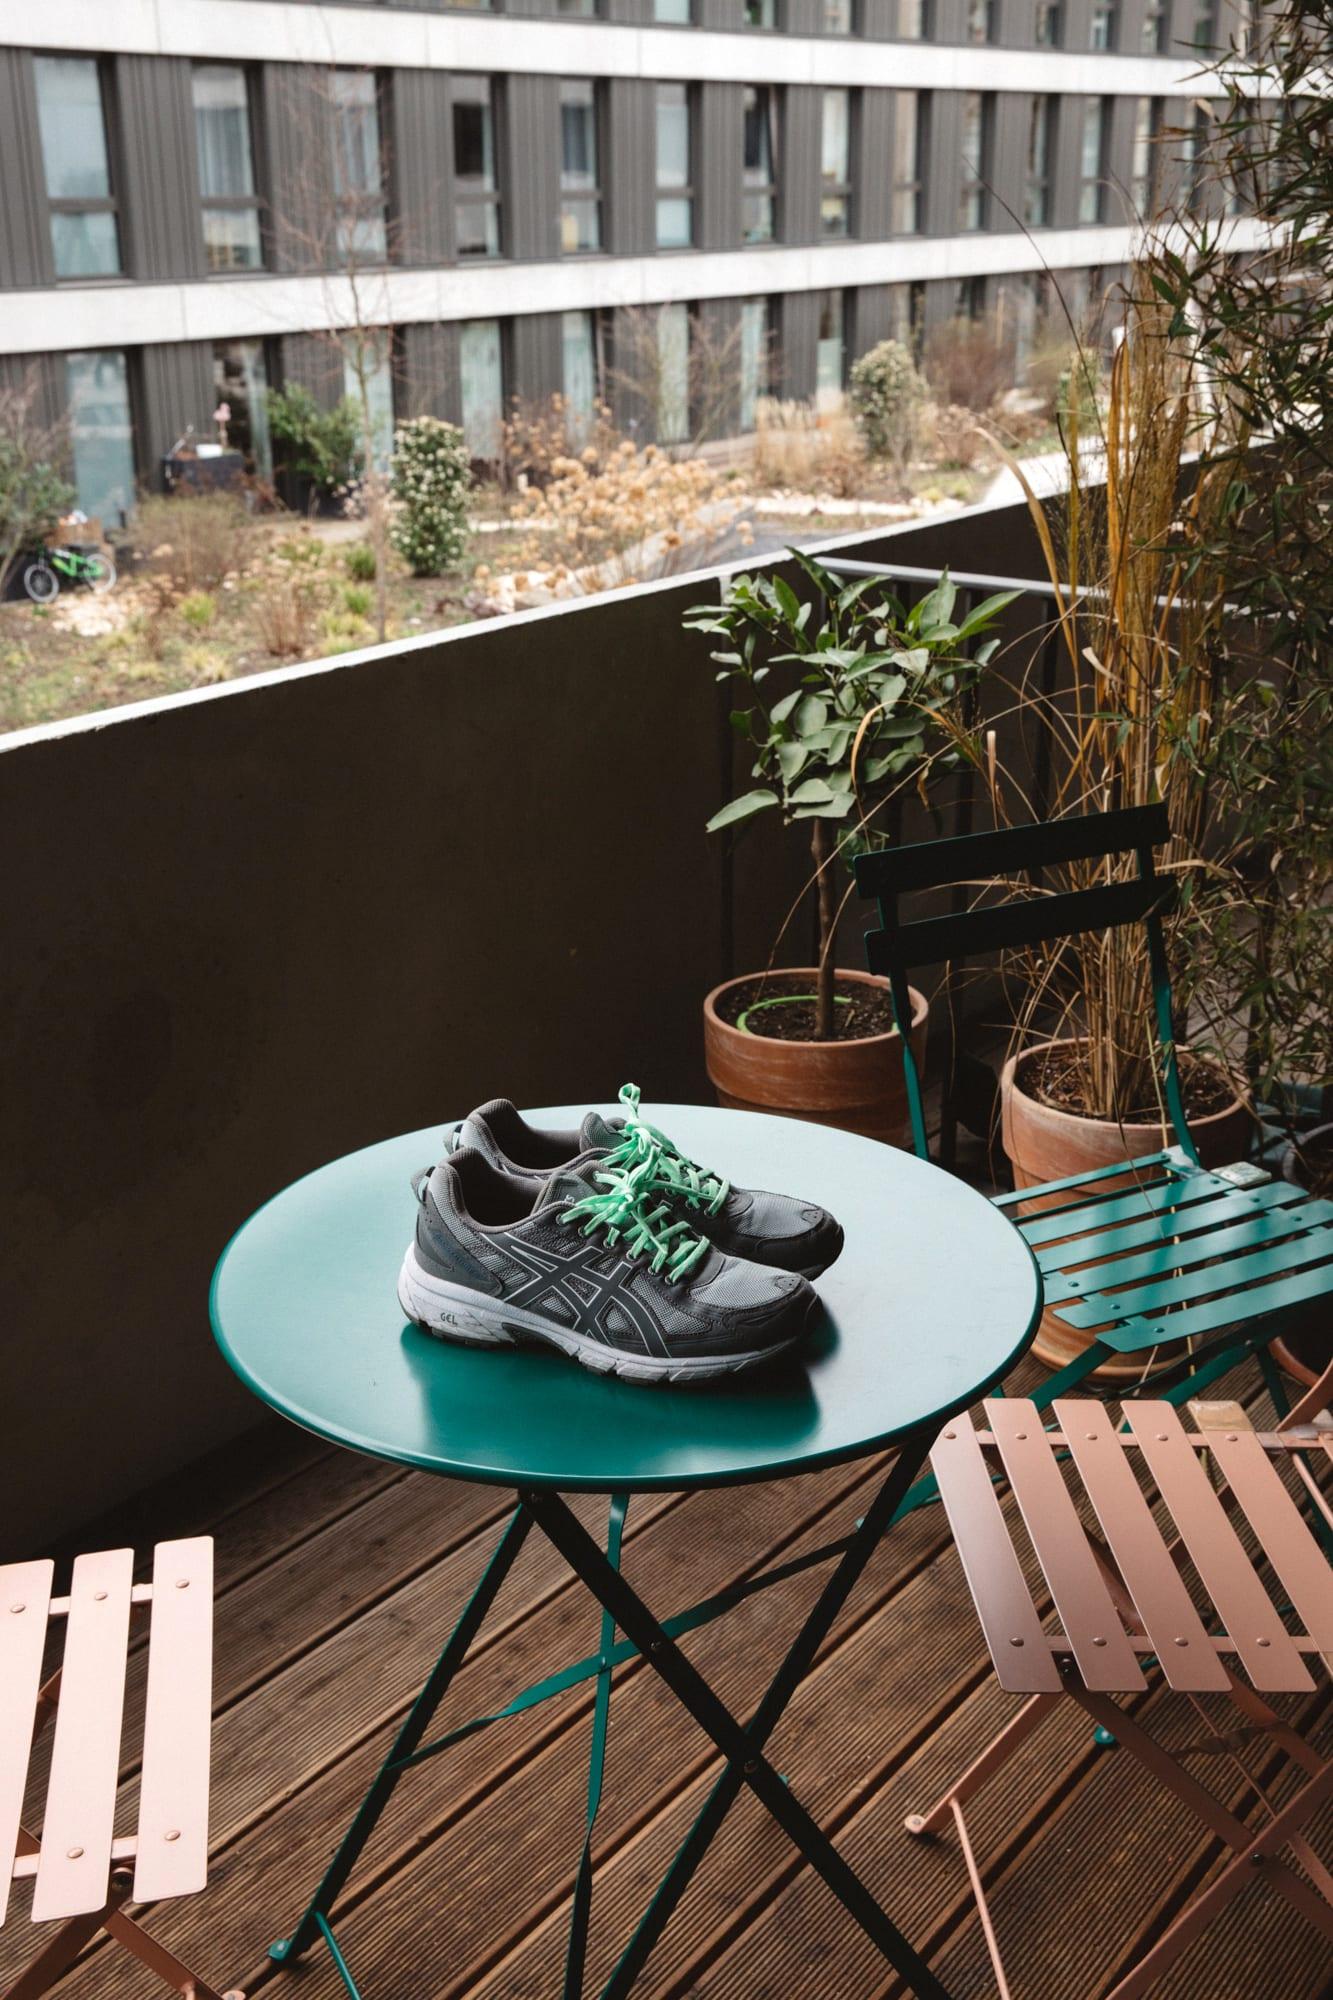 Flight Case Sneakers: Fabian Gorsler at Home in Berlin, image features ASICS x Harmony GEL-Venture 6